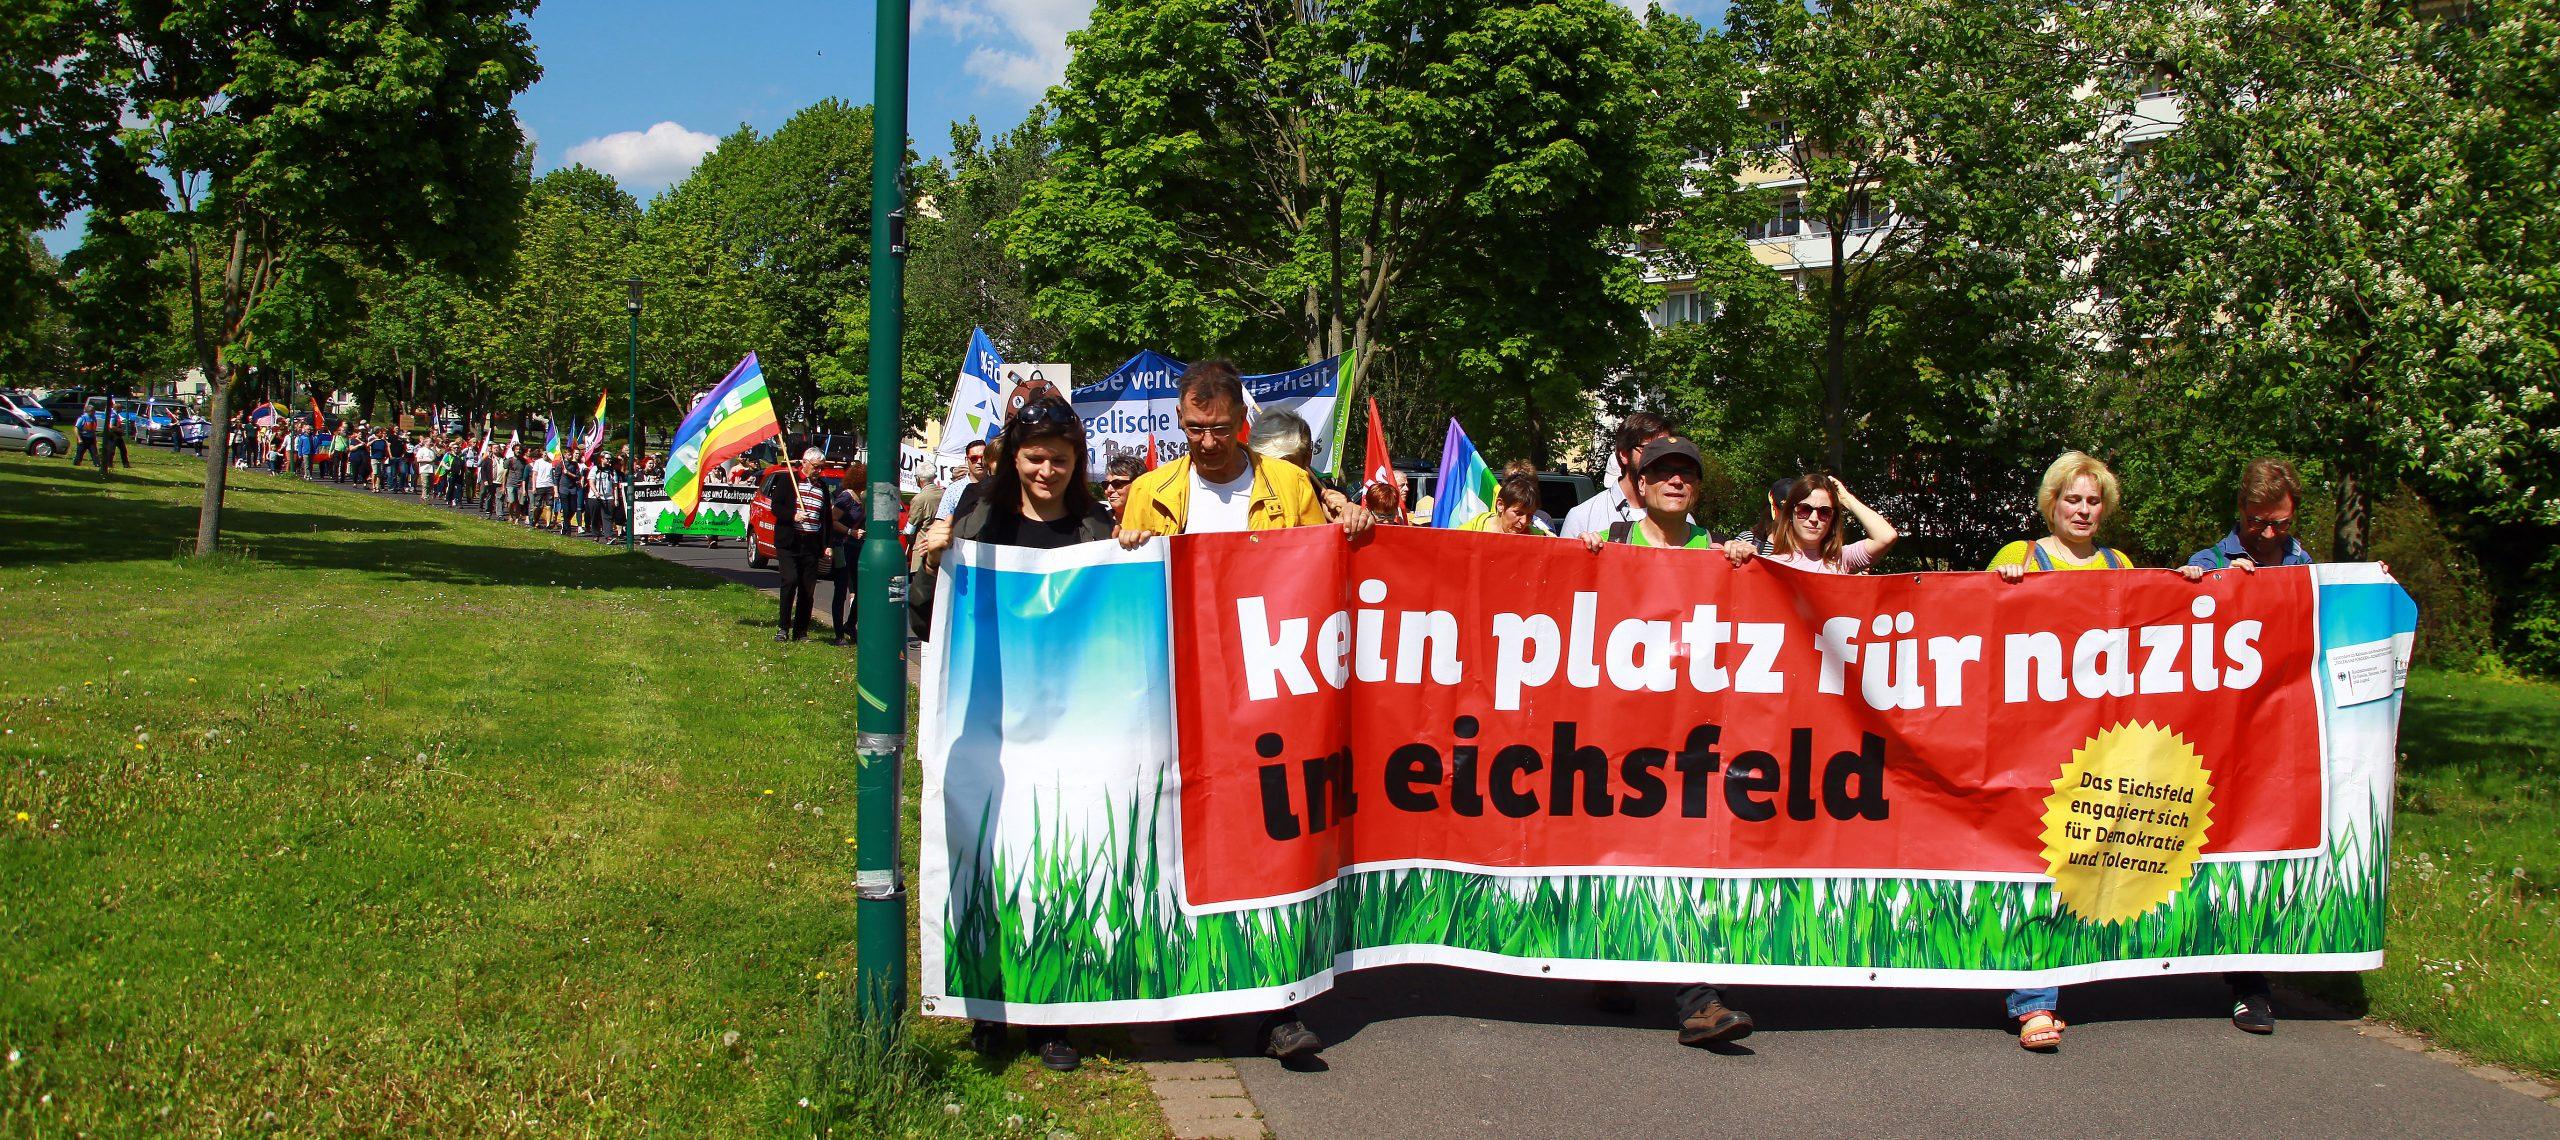 Protestzug gegen den Eichsfeldtag im Mai 2019